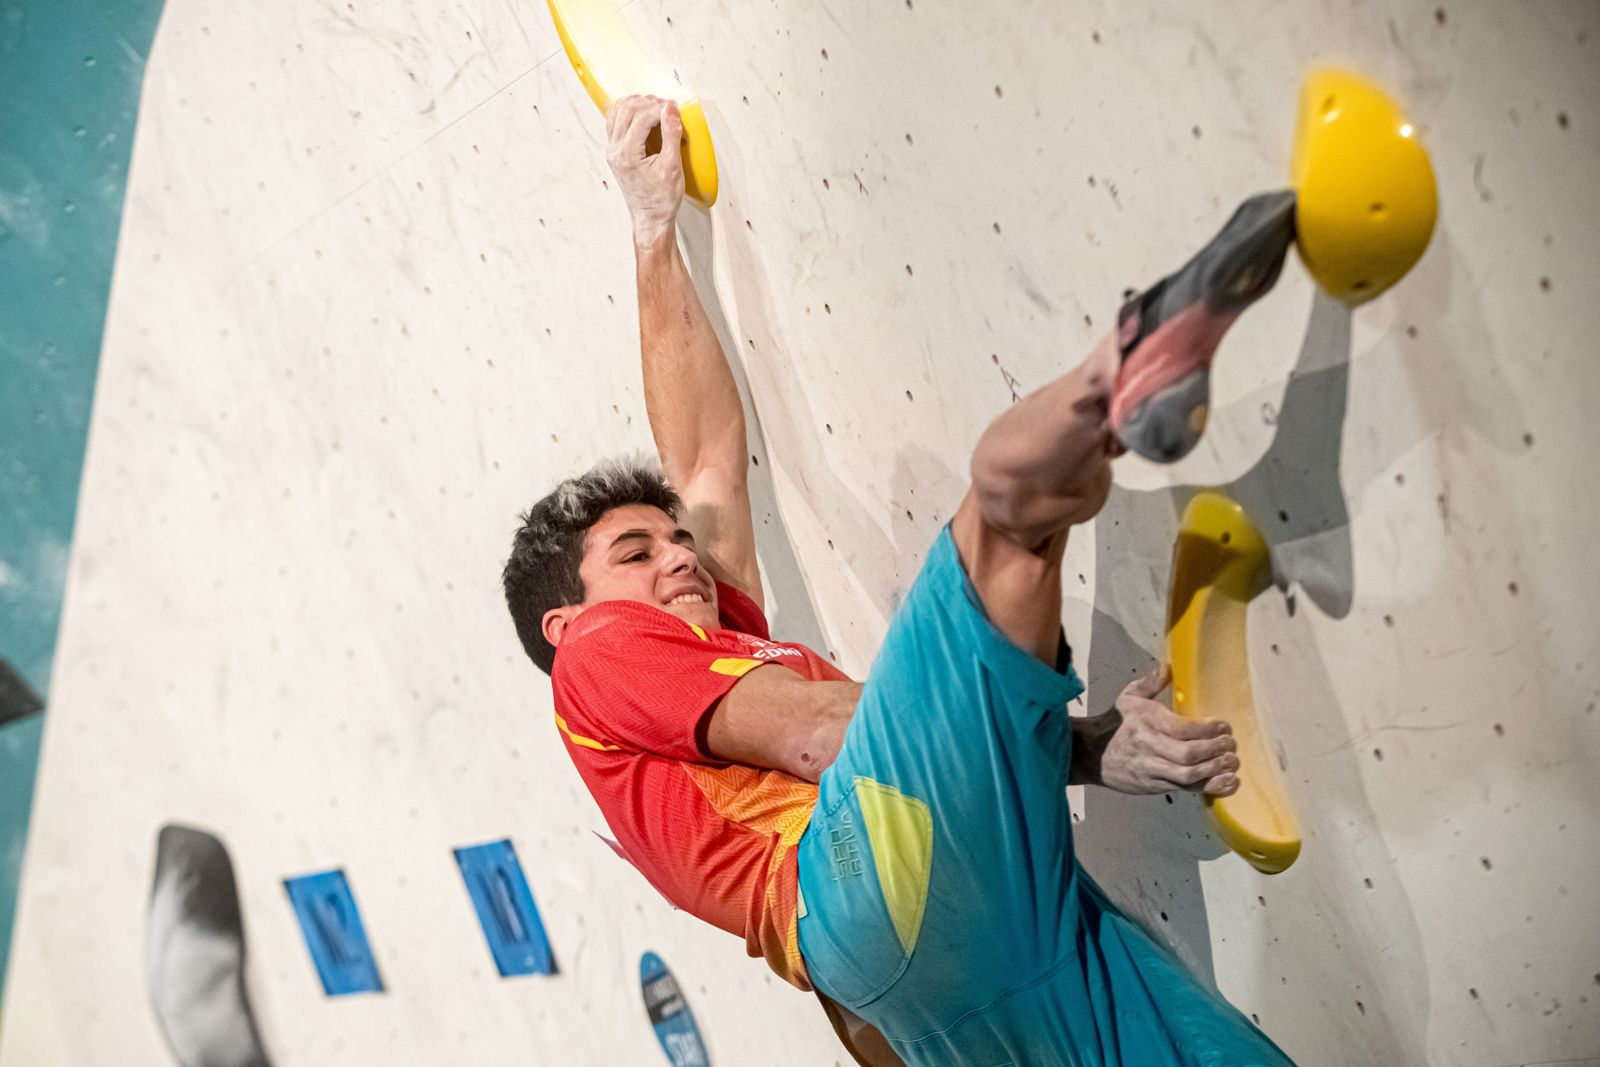 Spanish climber Alberto Gines Lopez, Brno, Czech Republic - 15 Feb 2020